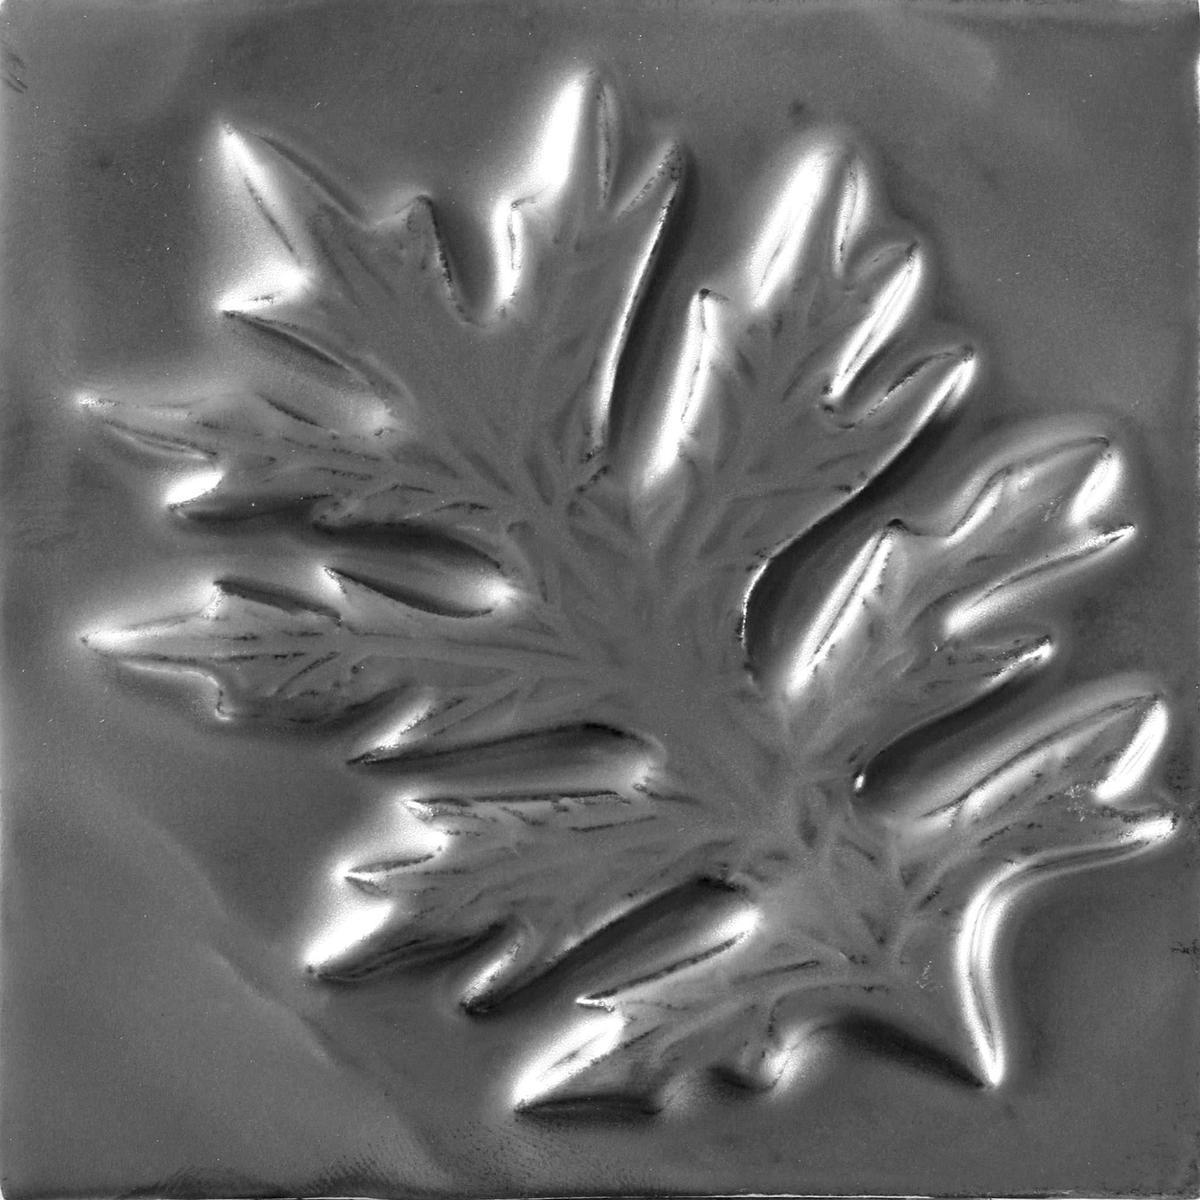 venta de esmalte para cerámica amaco textured alligator Lt-3 old pewter baja temperatura